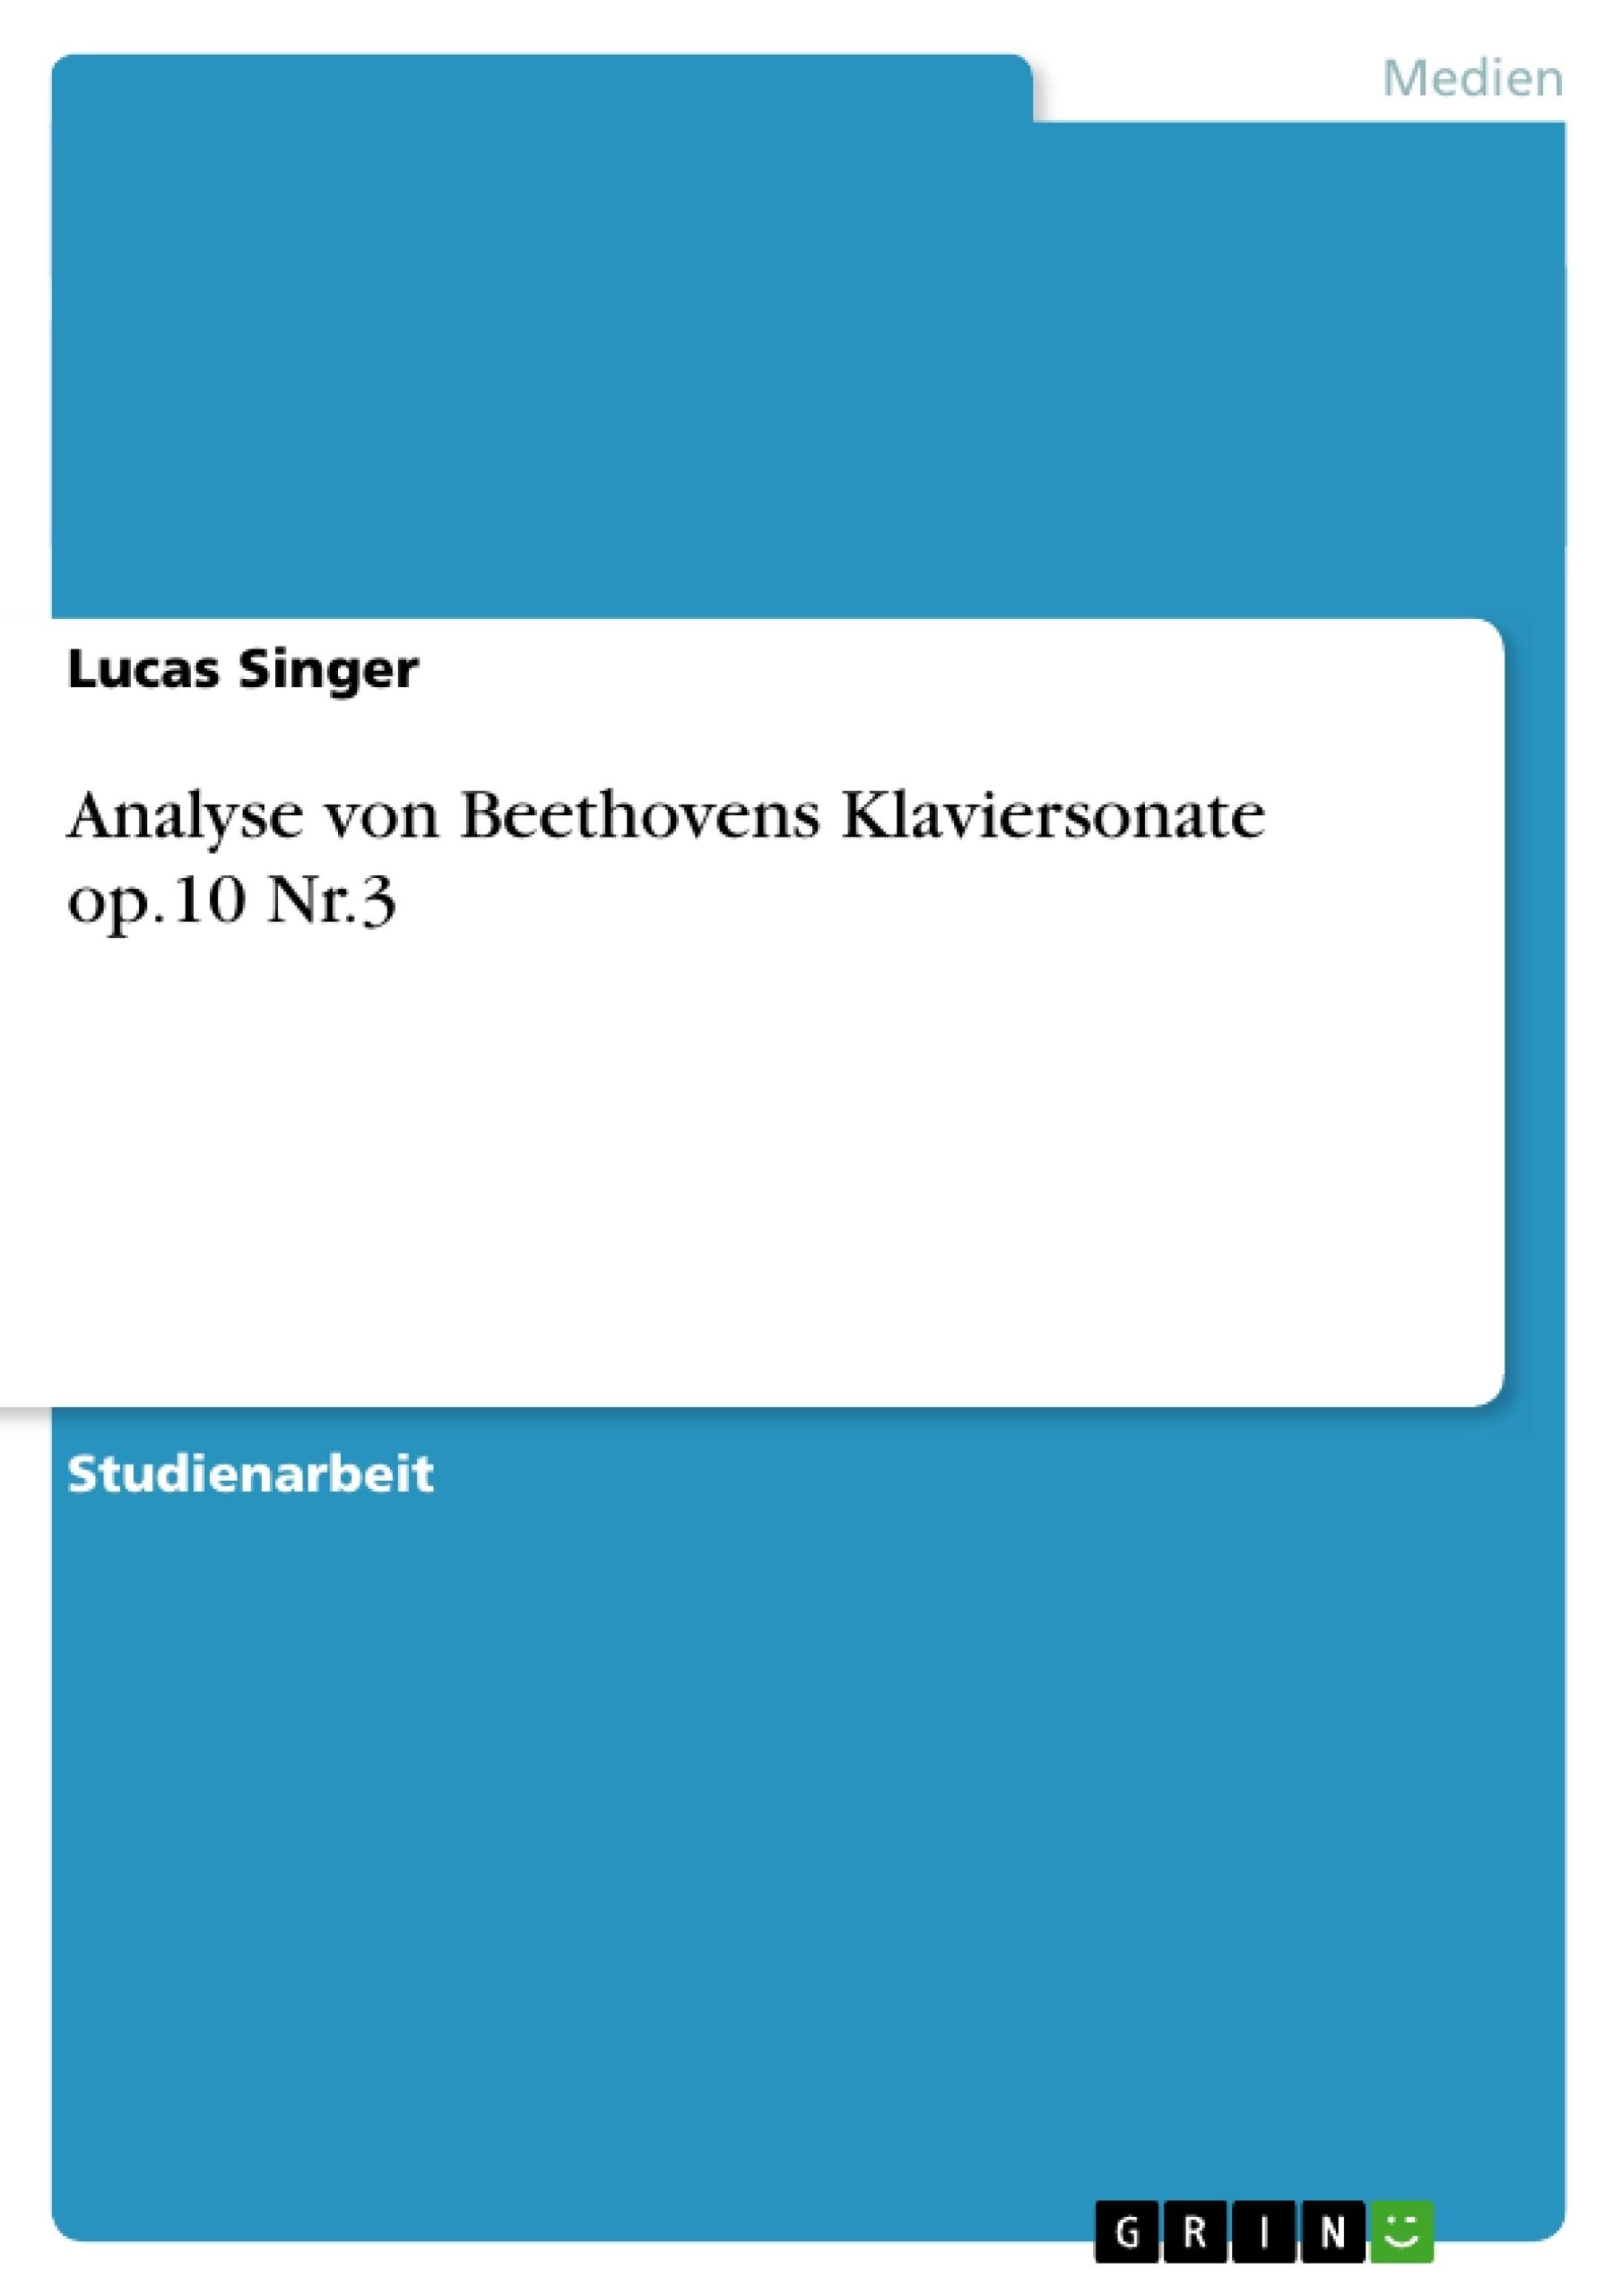 Titel: Analyse von Beethovens Klaviersonate op.10 Nr.3